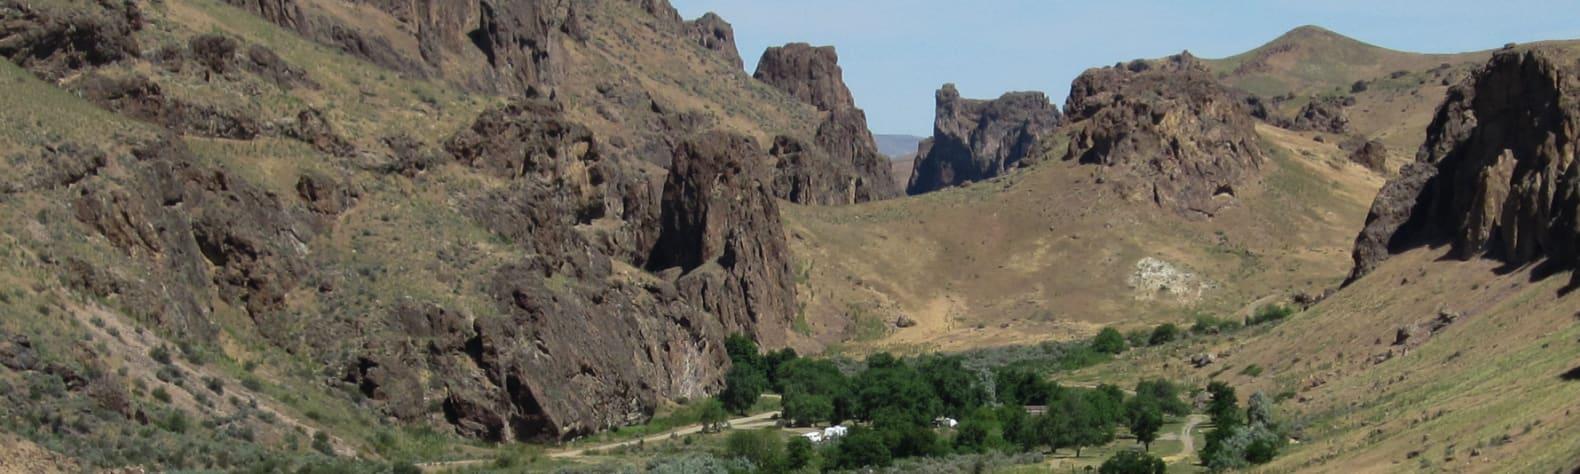 Succor Creek State Natural Area